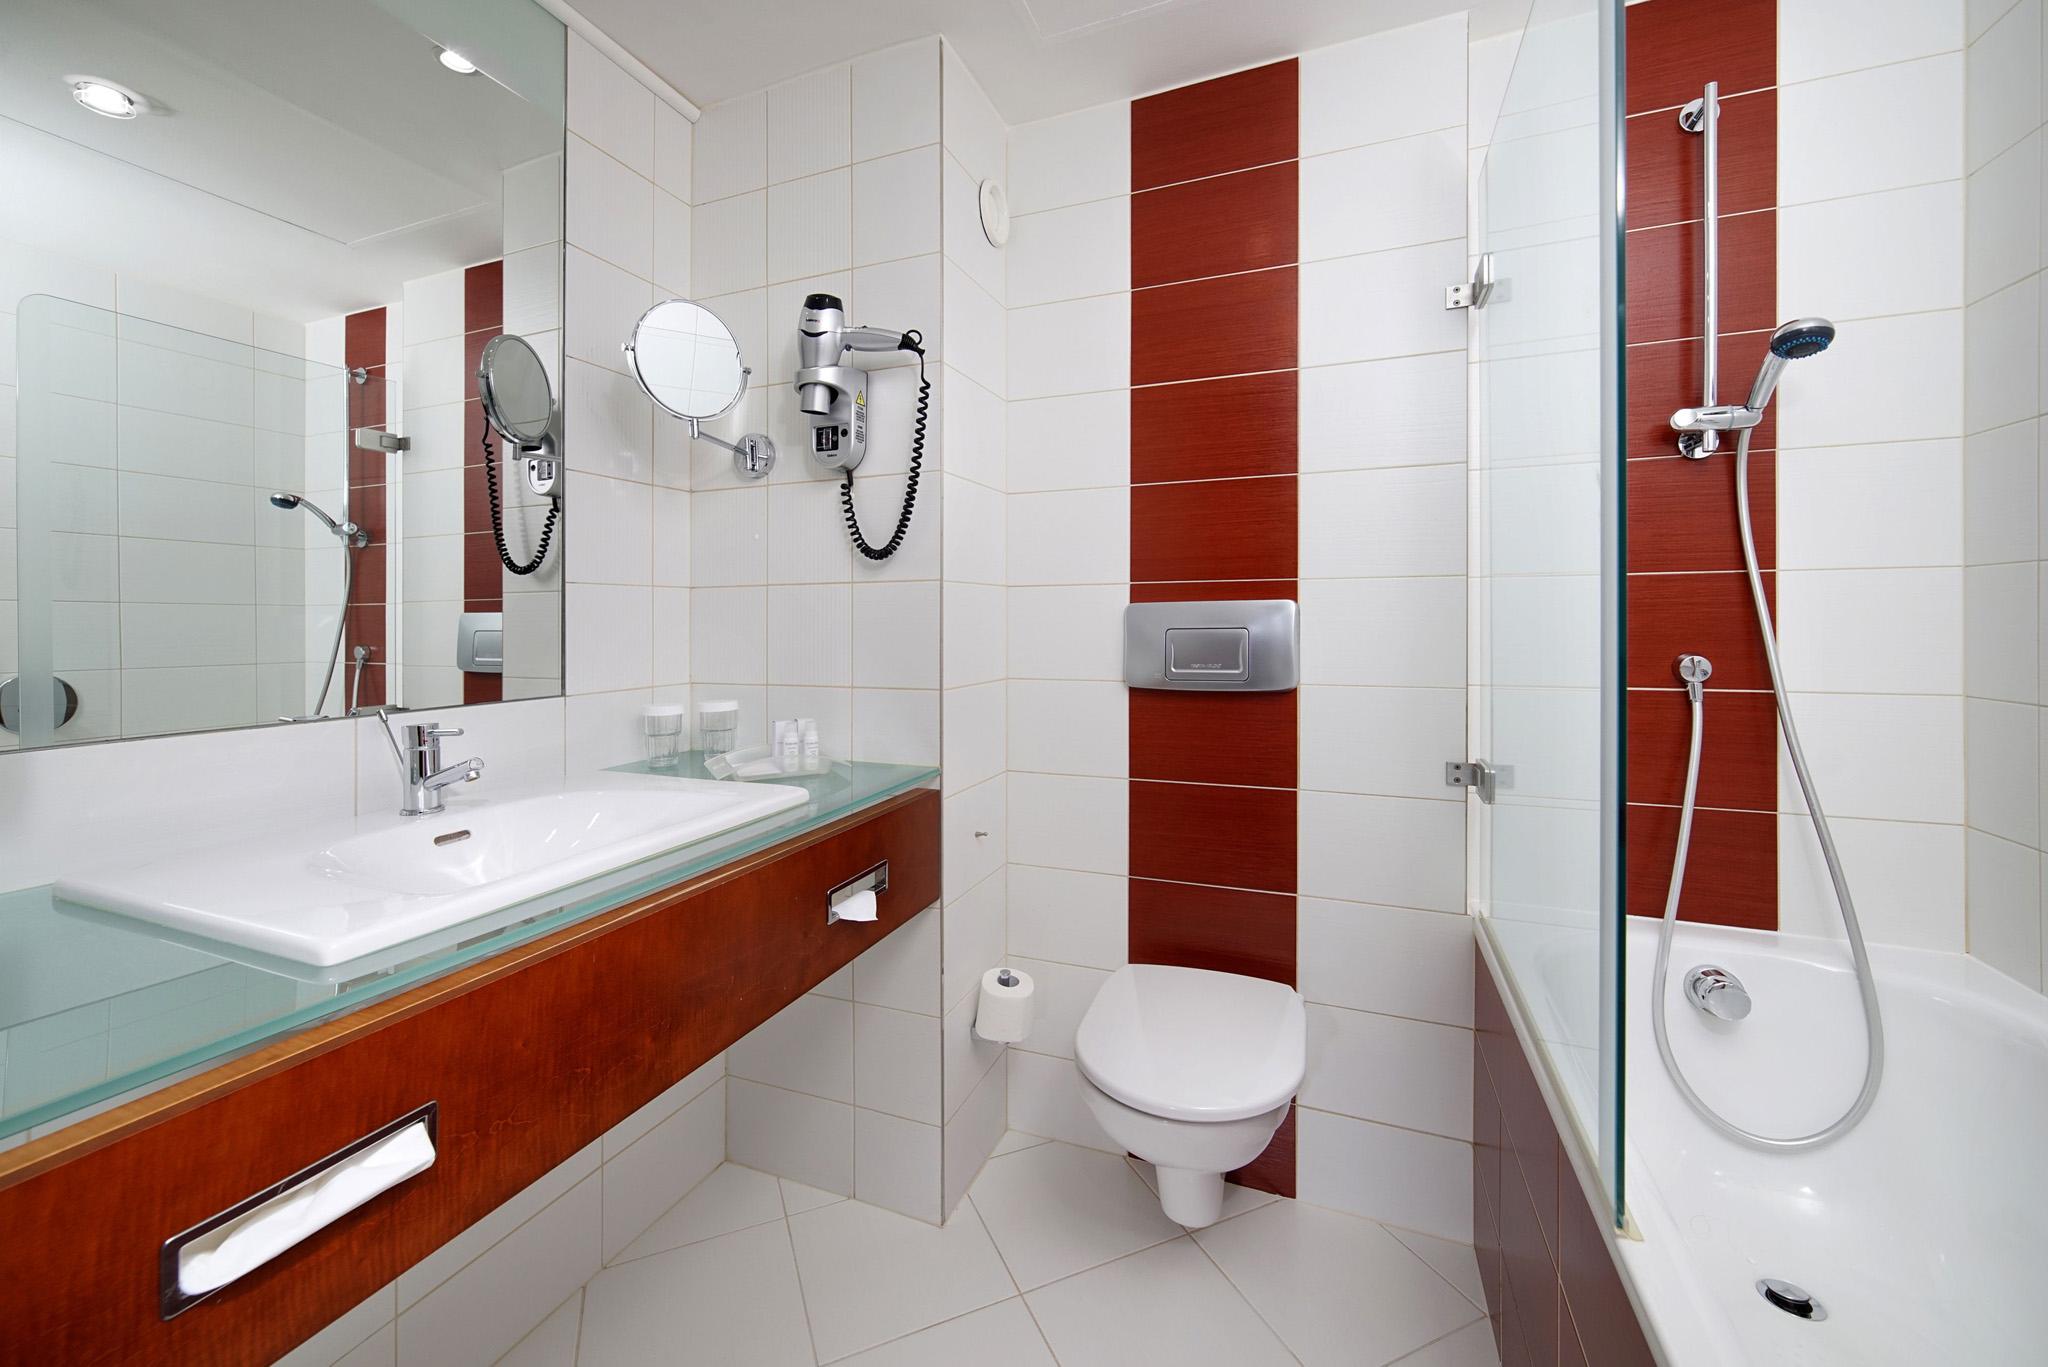 Hotelu Holiday Inn Brno 4